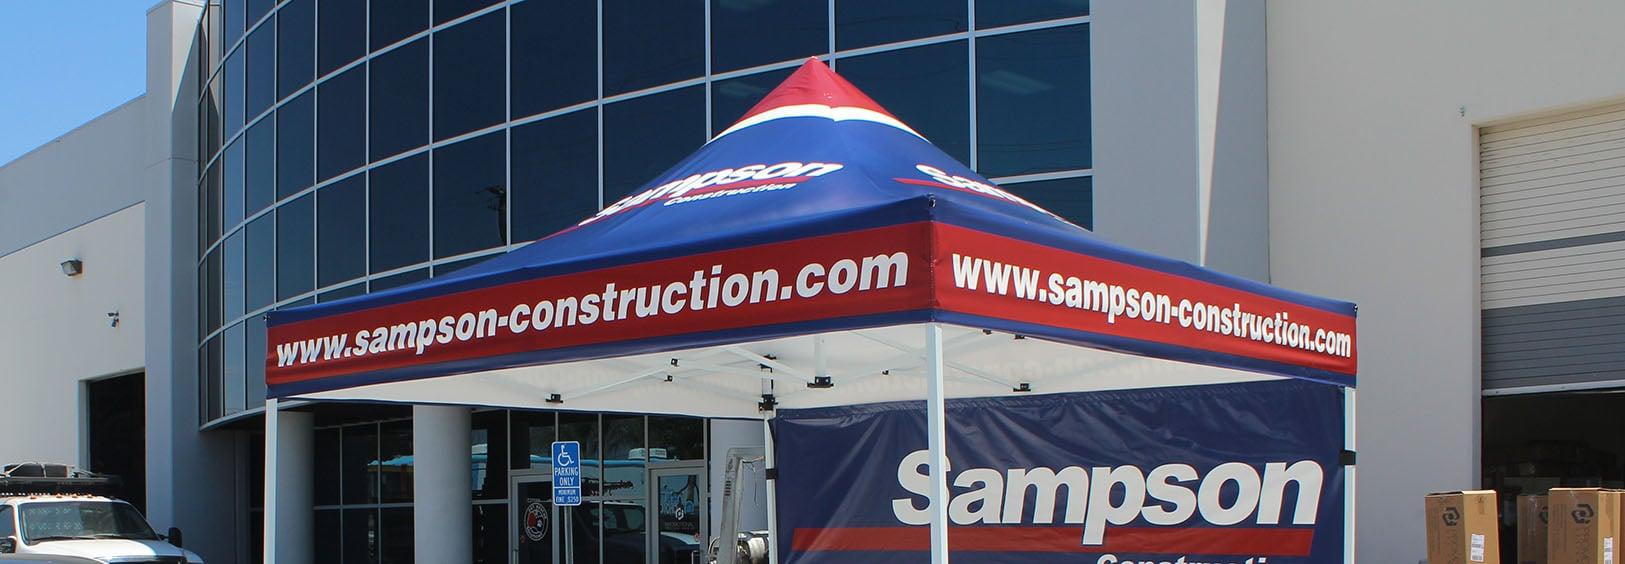 sampson-construction-header.jpg